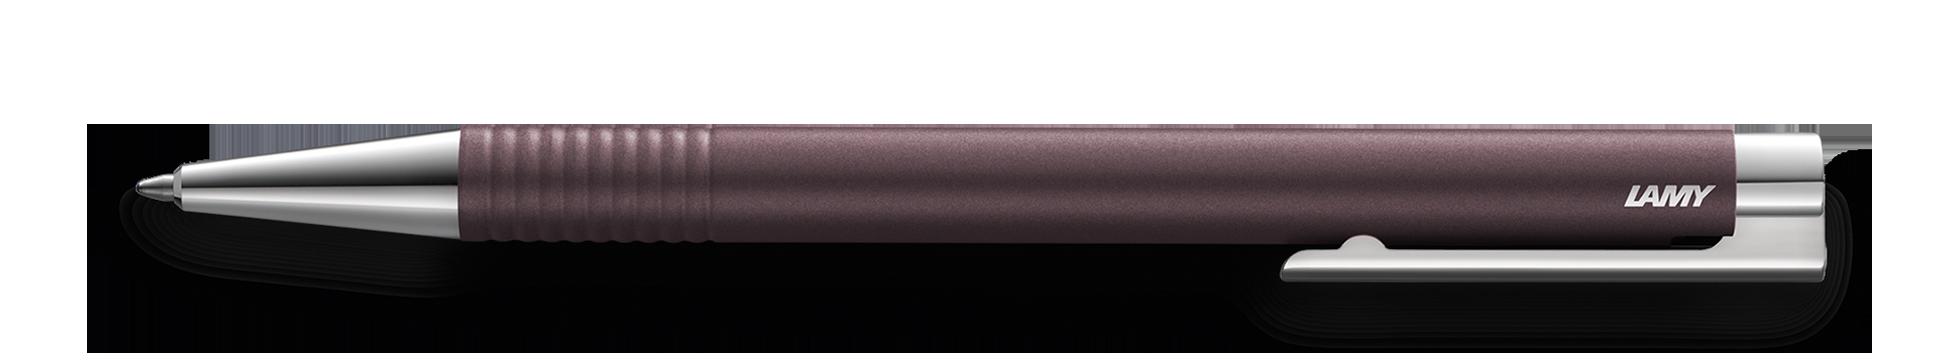 LAMY logo twighlight Special Edition Ballpoint pen